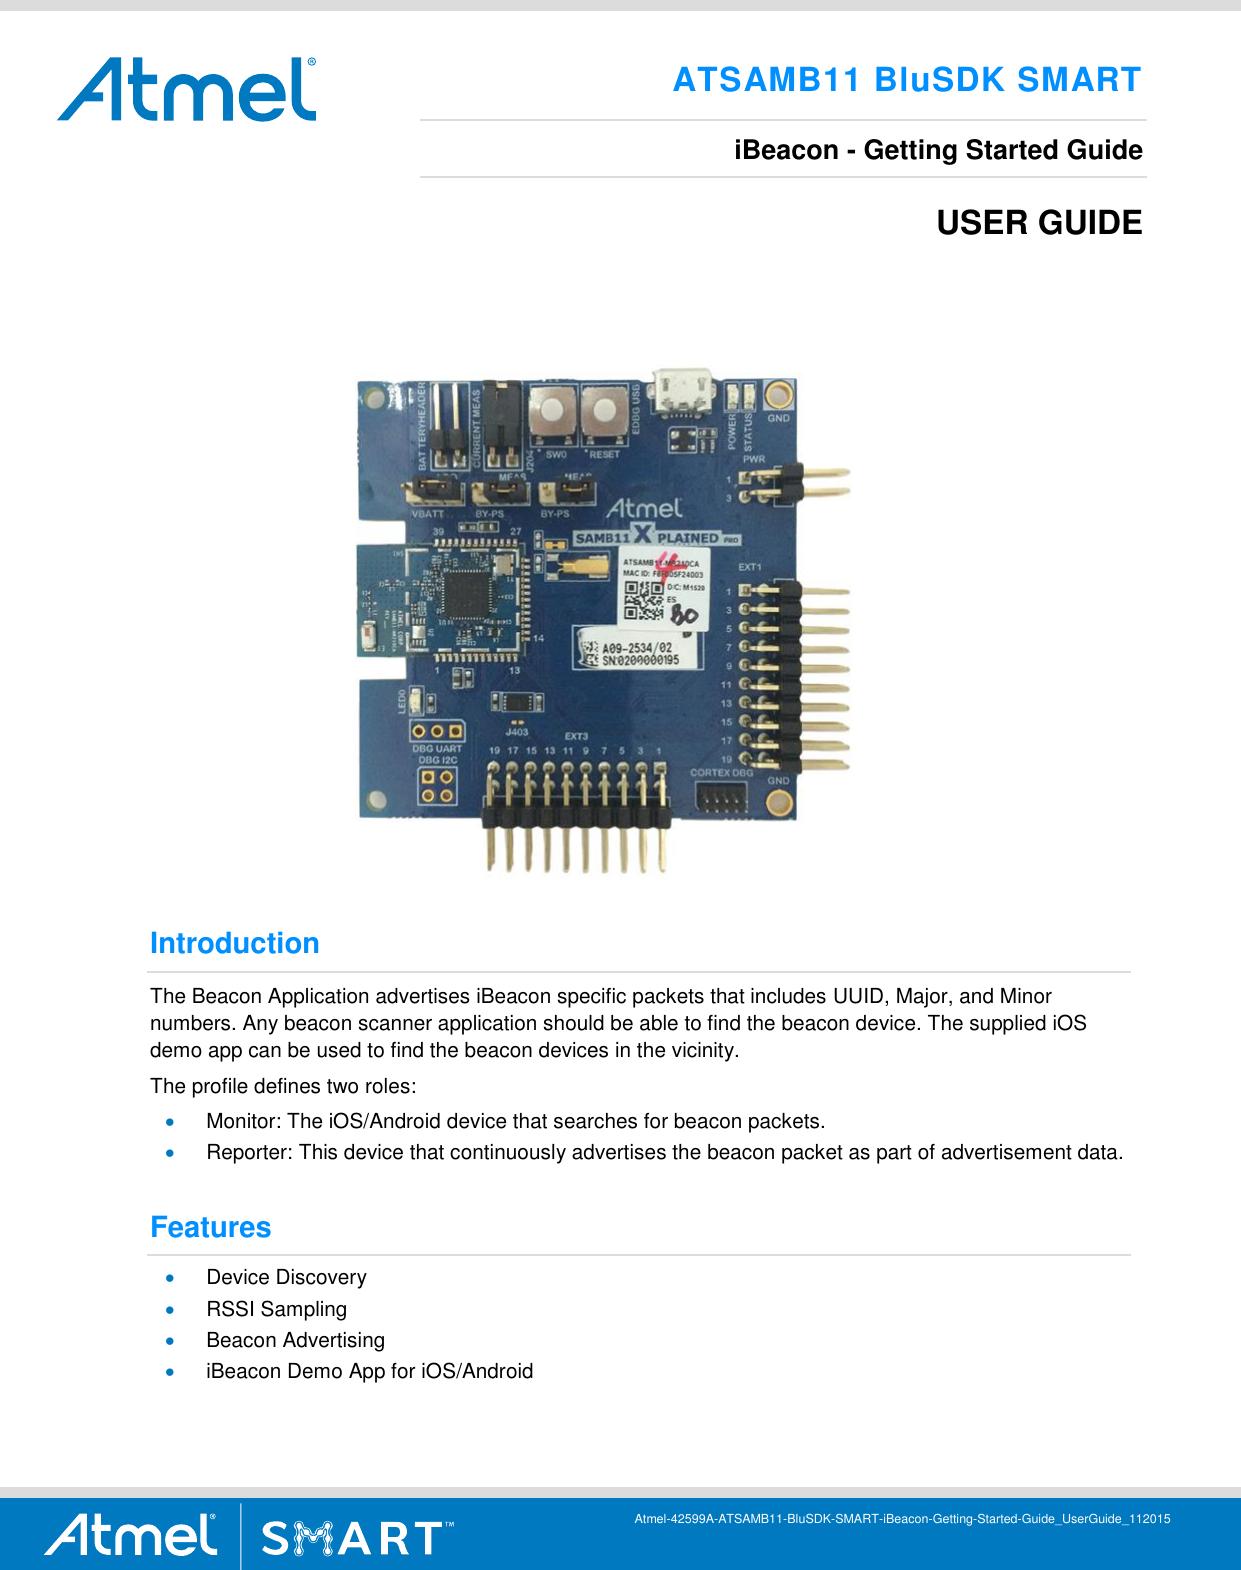 ATSAMB11 BluSDK SMART IBeacon Getting Started Guide Atmel